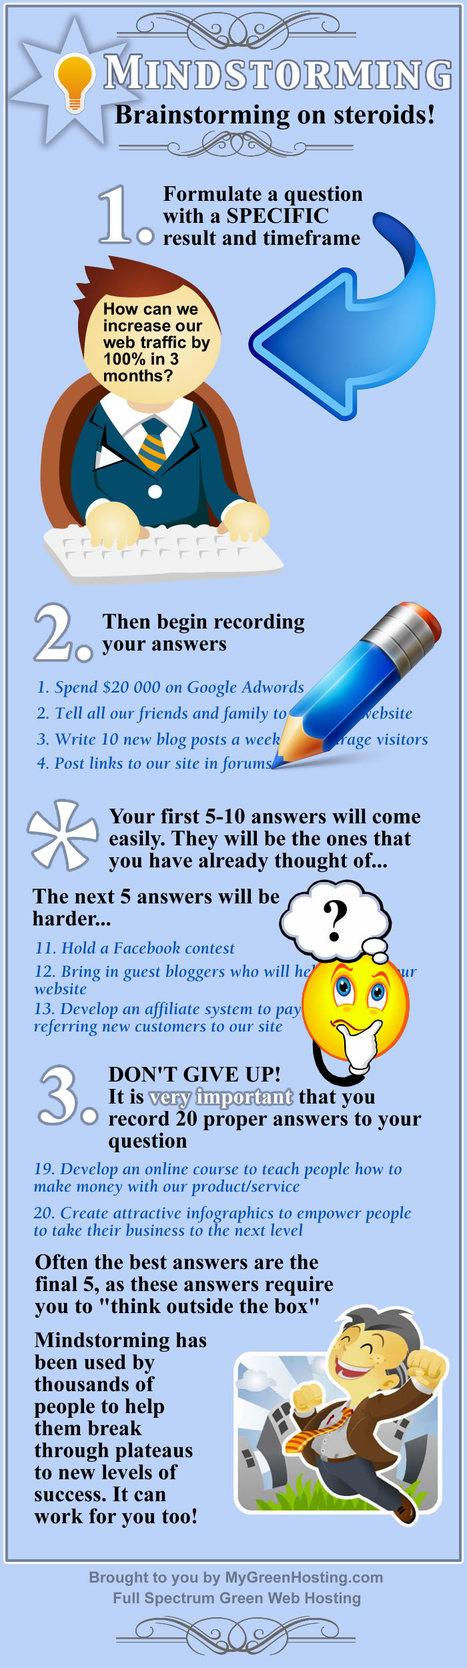 Mind Storming: The 20 Idea Method (Infographic) - | Creativity Scoops! | Scoop.it